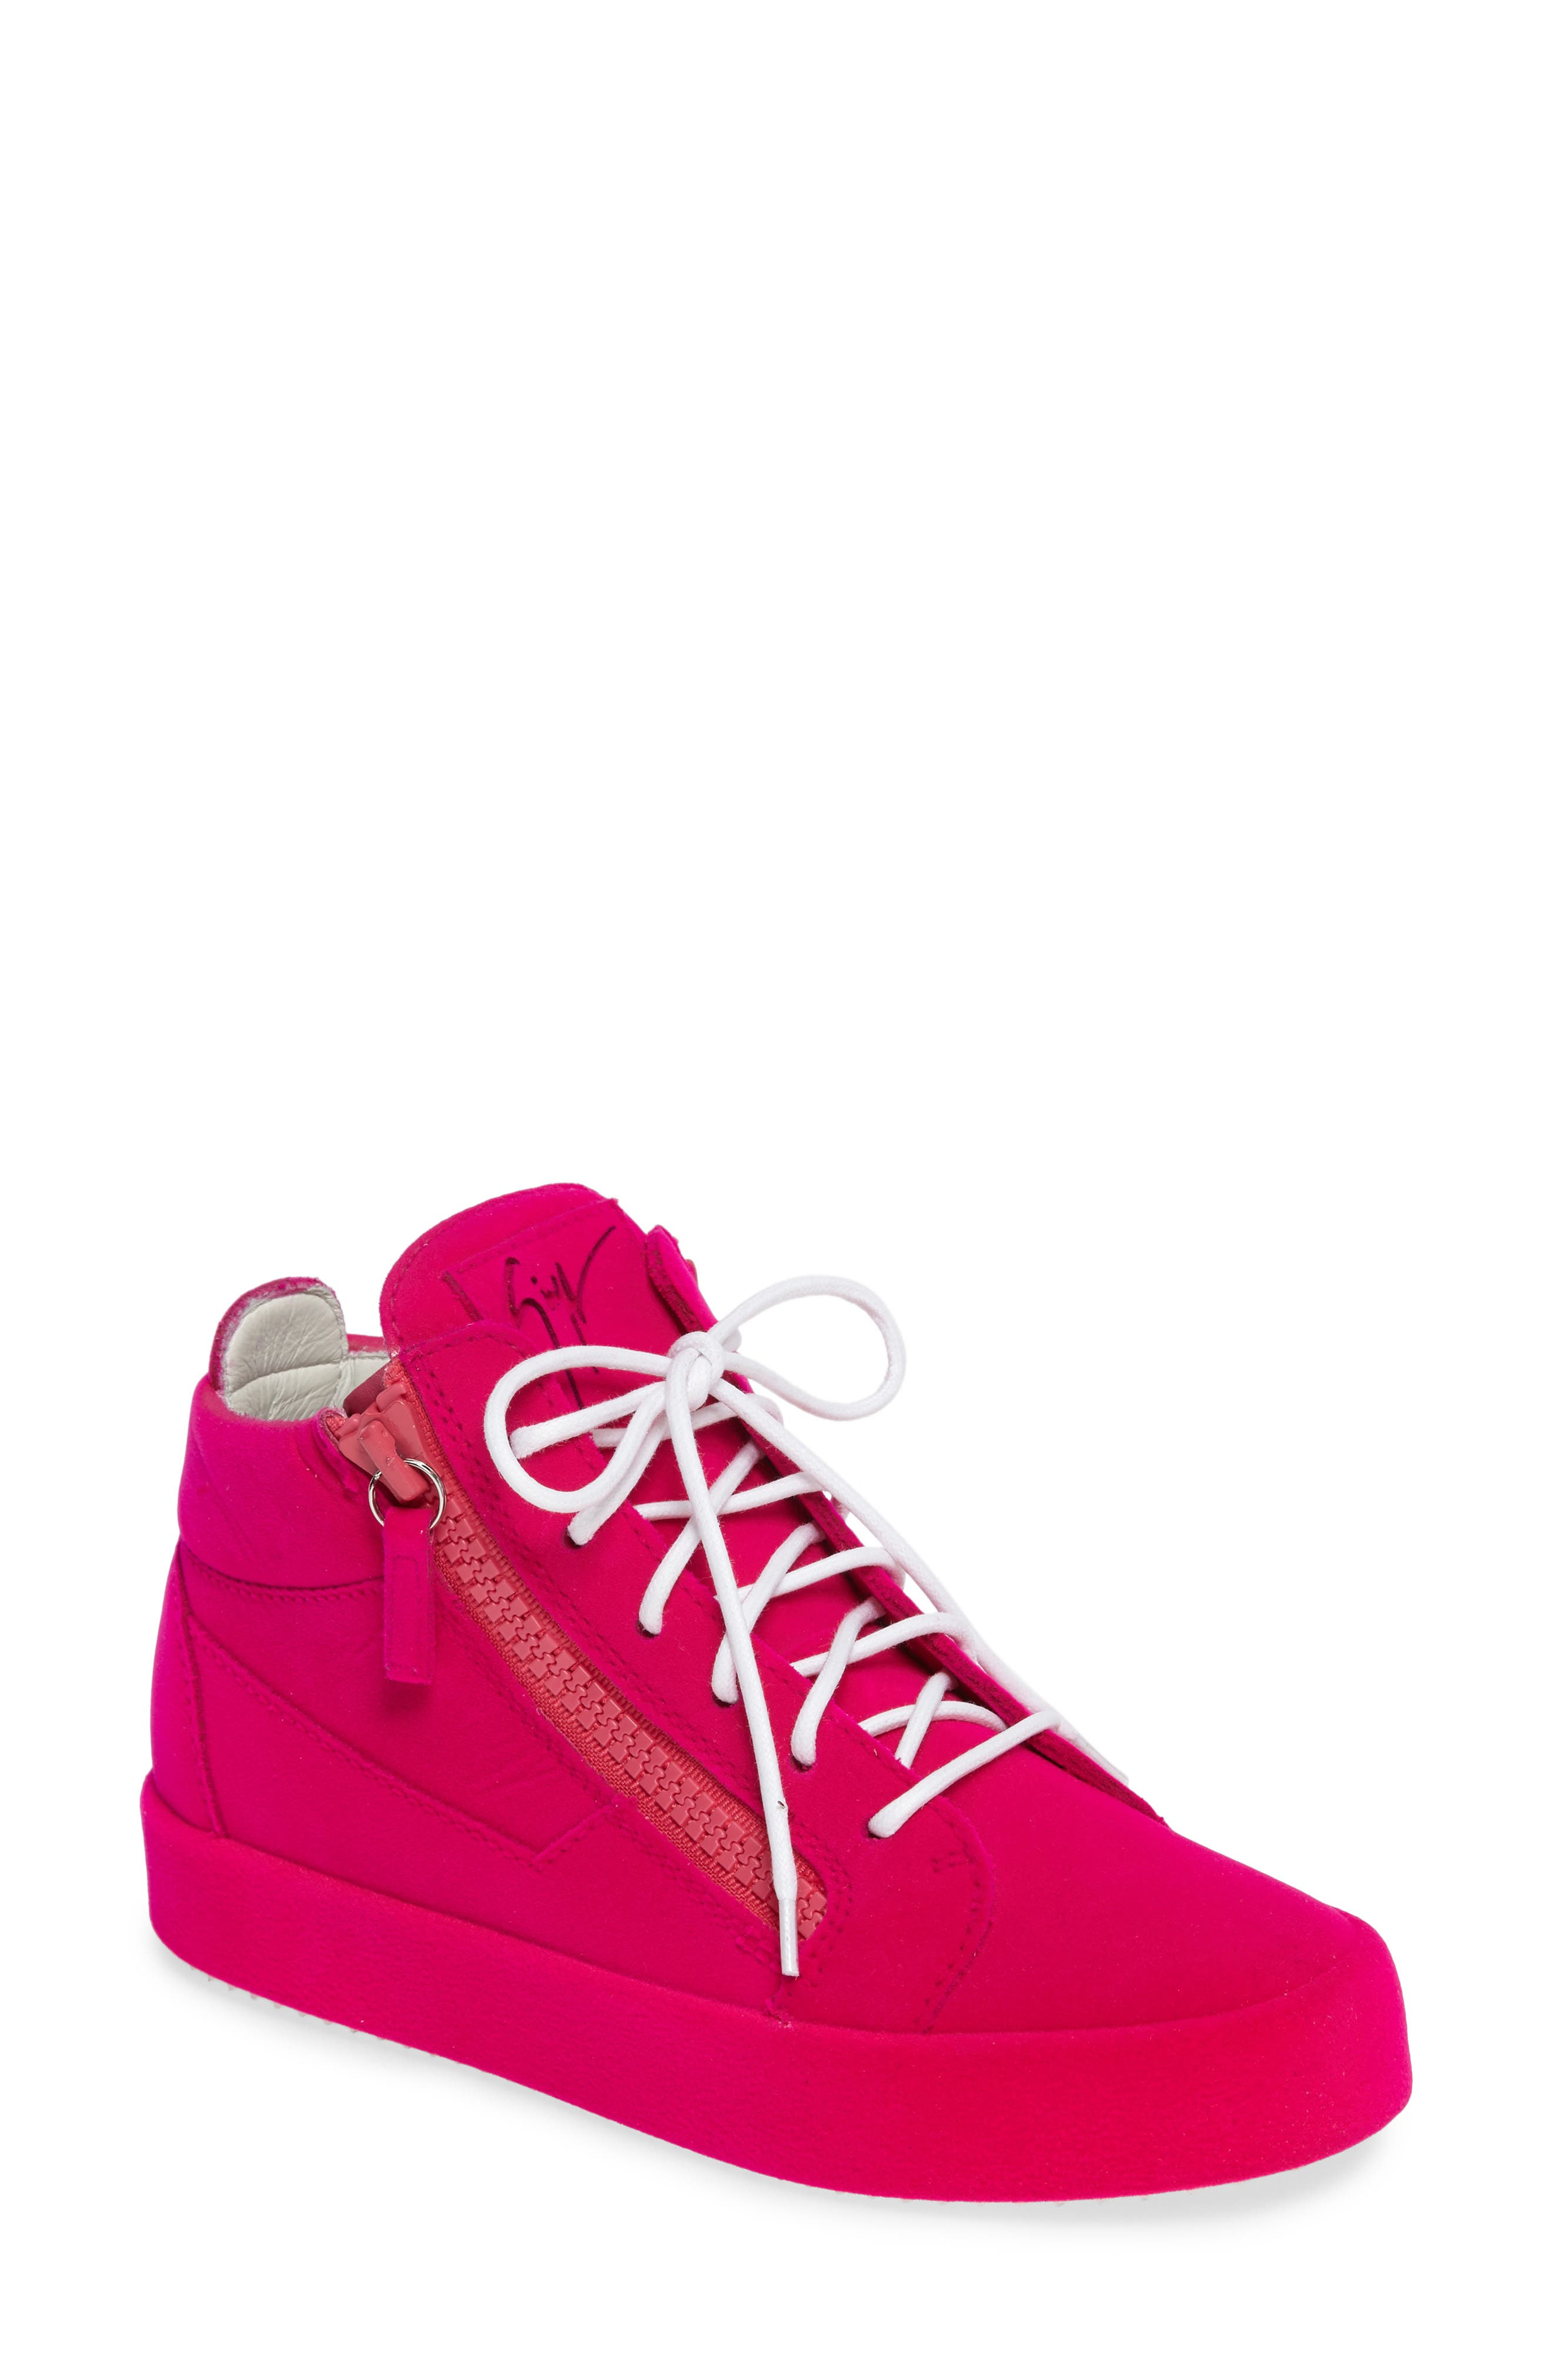 Designer Tennis Shoes